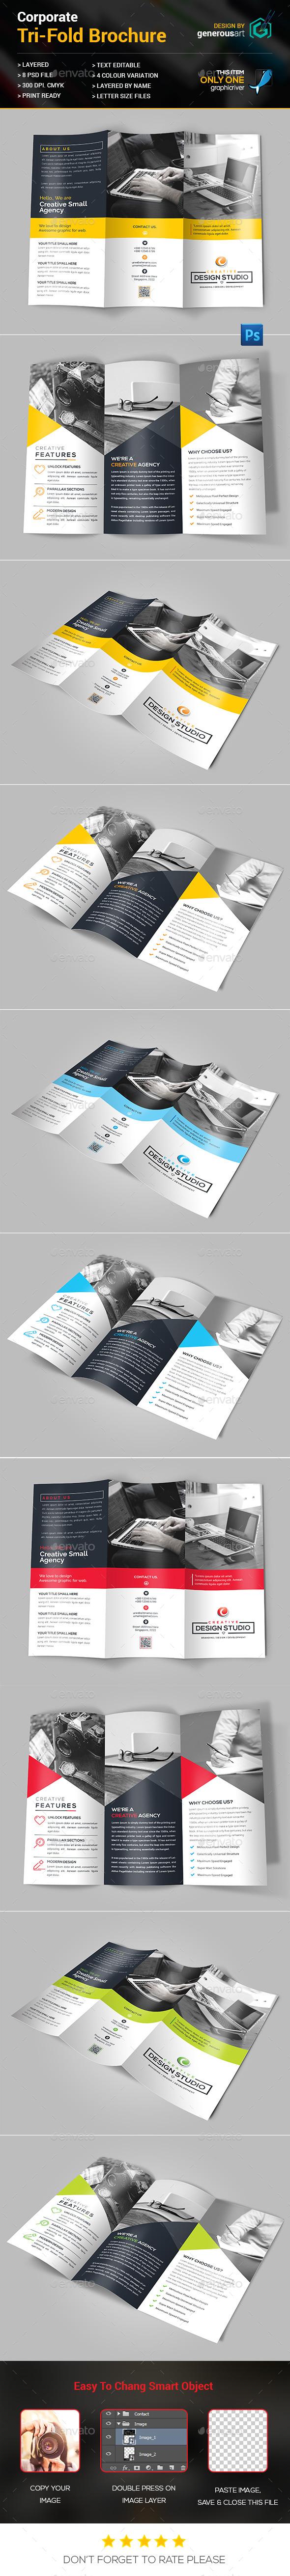 Agency Tri-Fold Brochure - Corporate Brochures